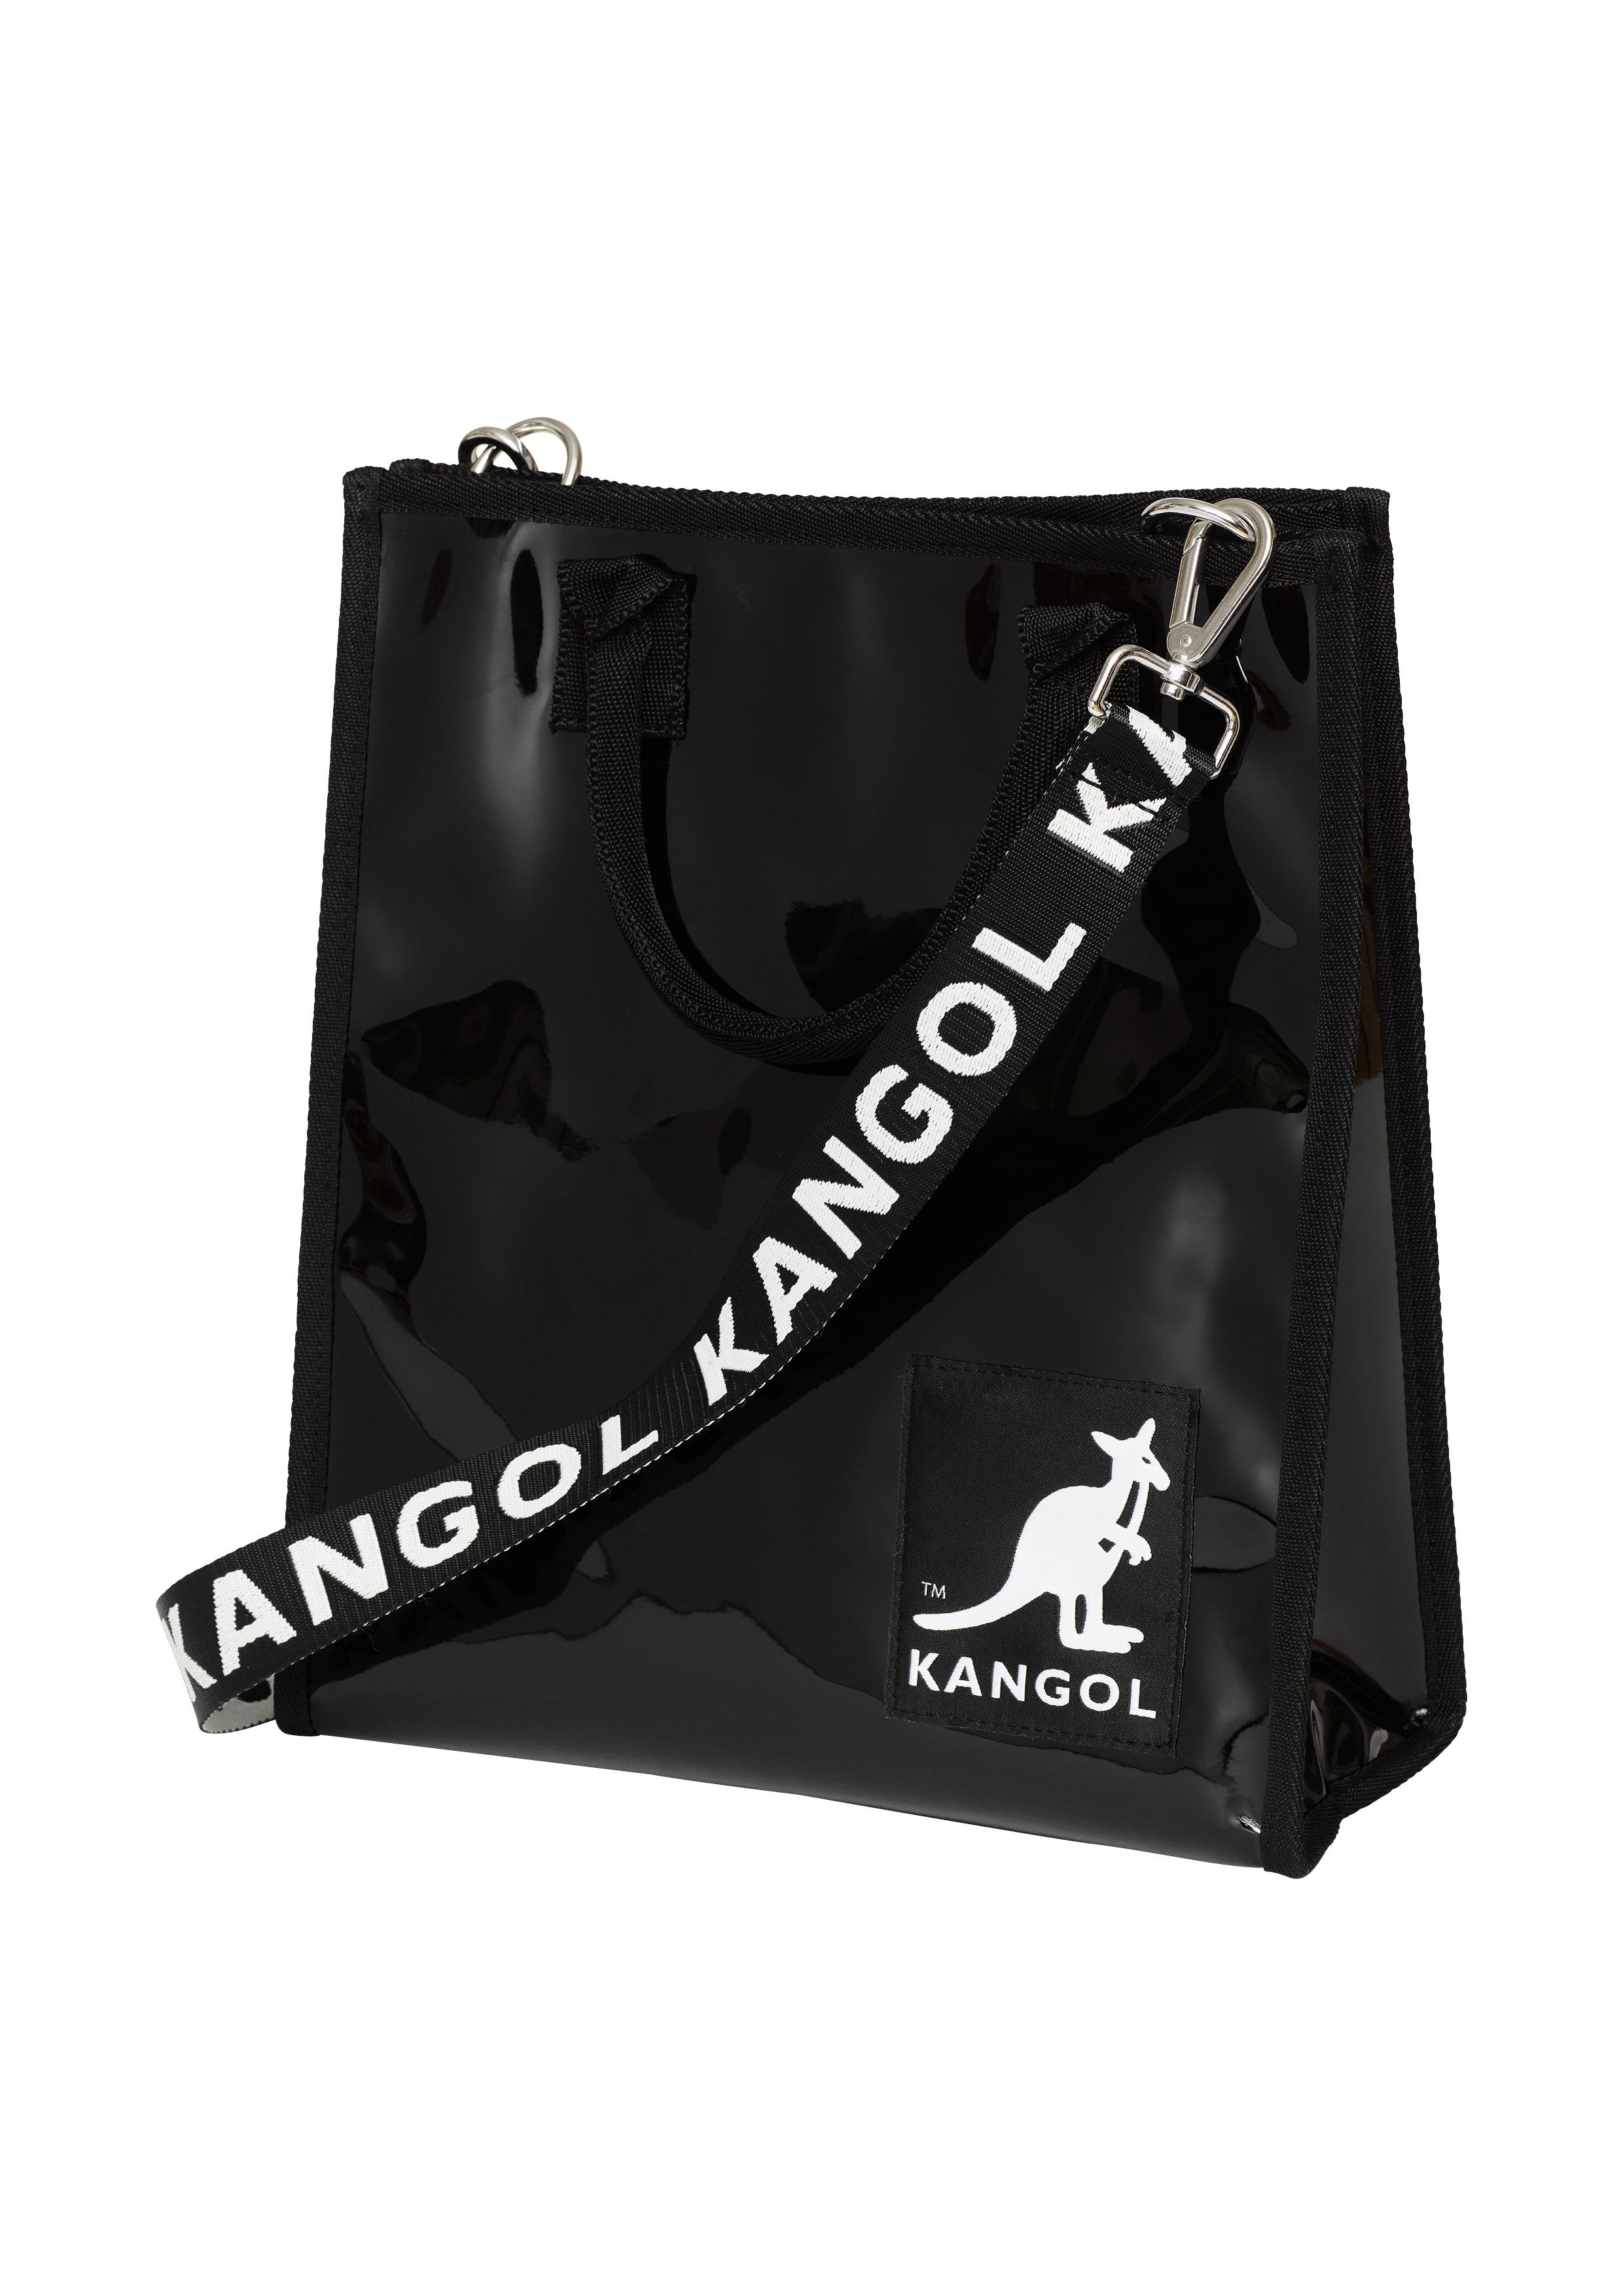 Kangol HM Collaboration feat Mabel 2020